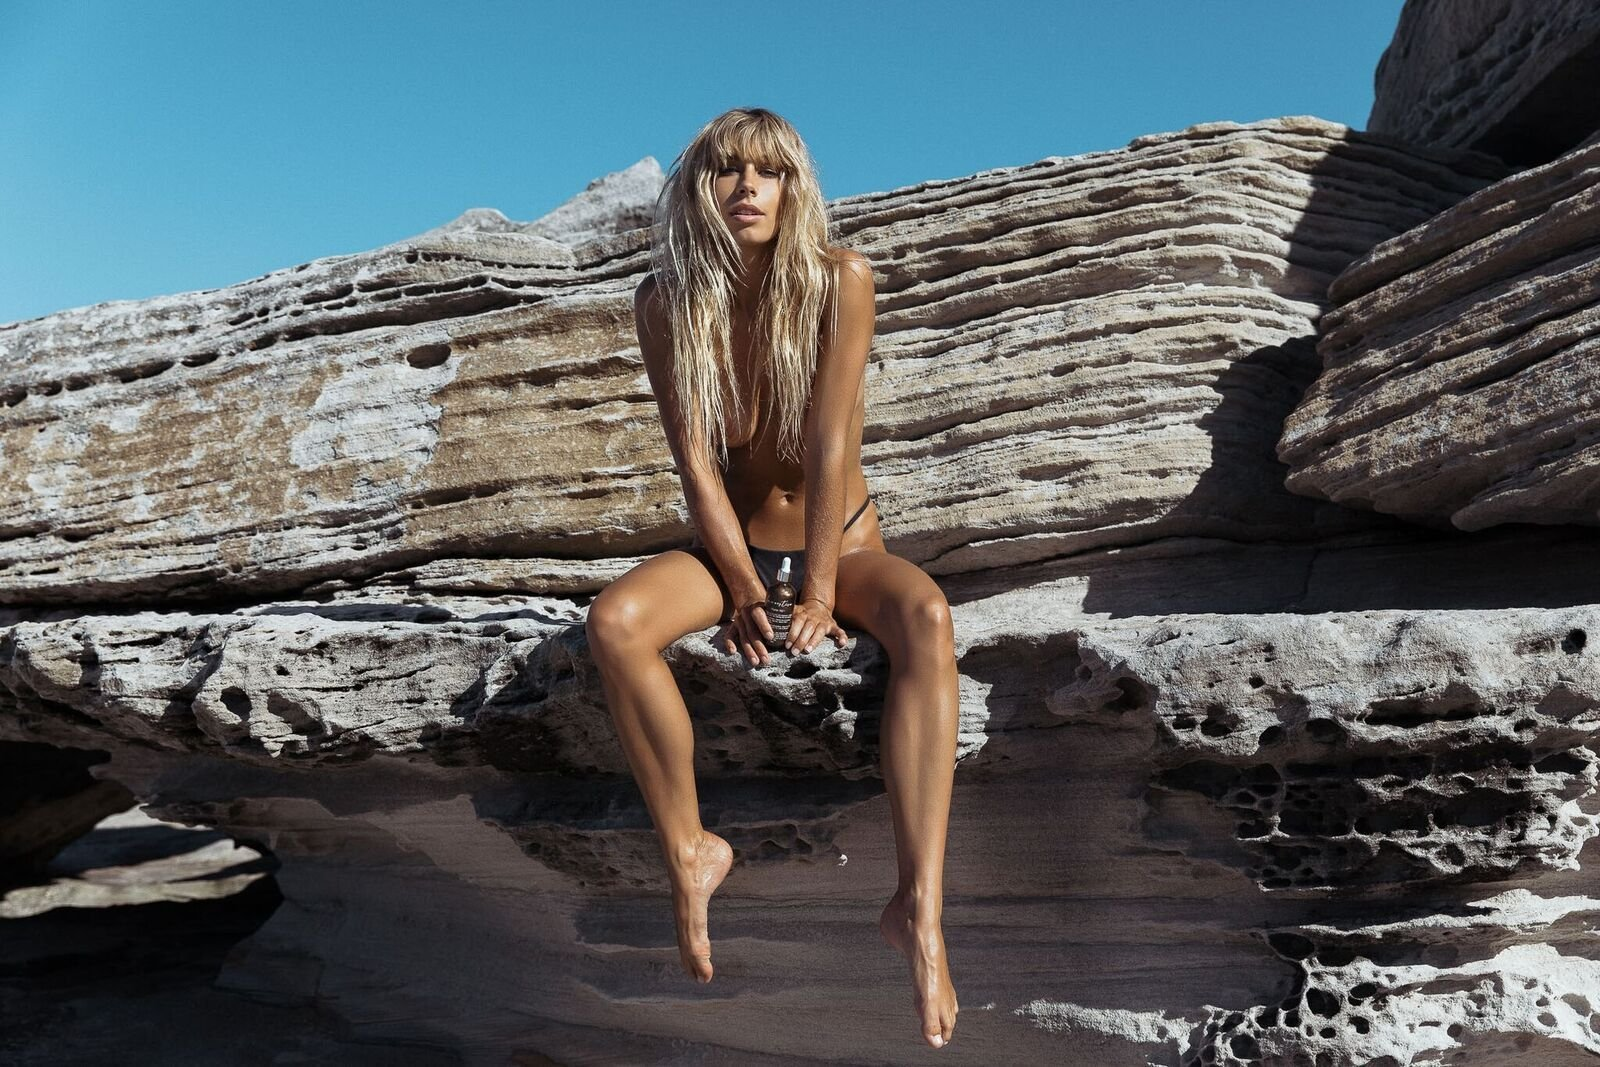 Blac chyna fappening,Joanna krupa sexy 6 Sex image Topless photoset of sabine jemeljanova,Melissa george nude